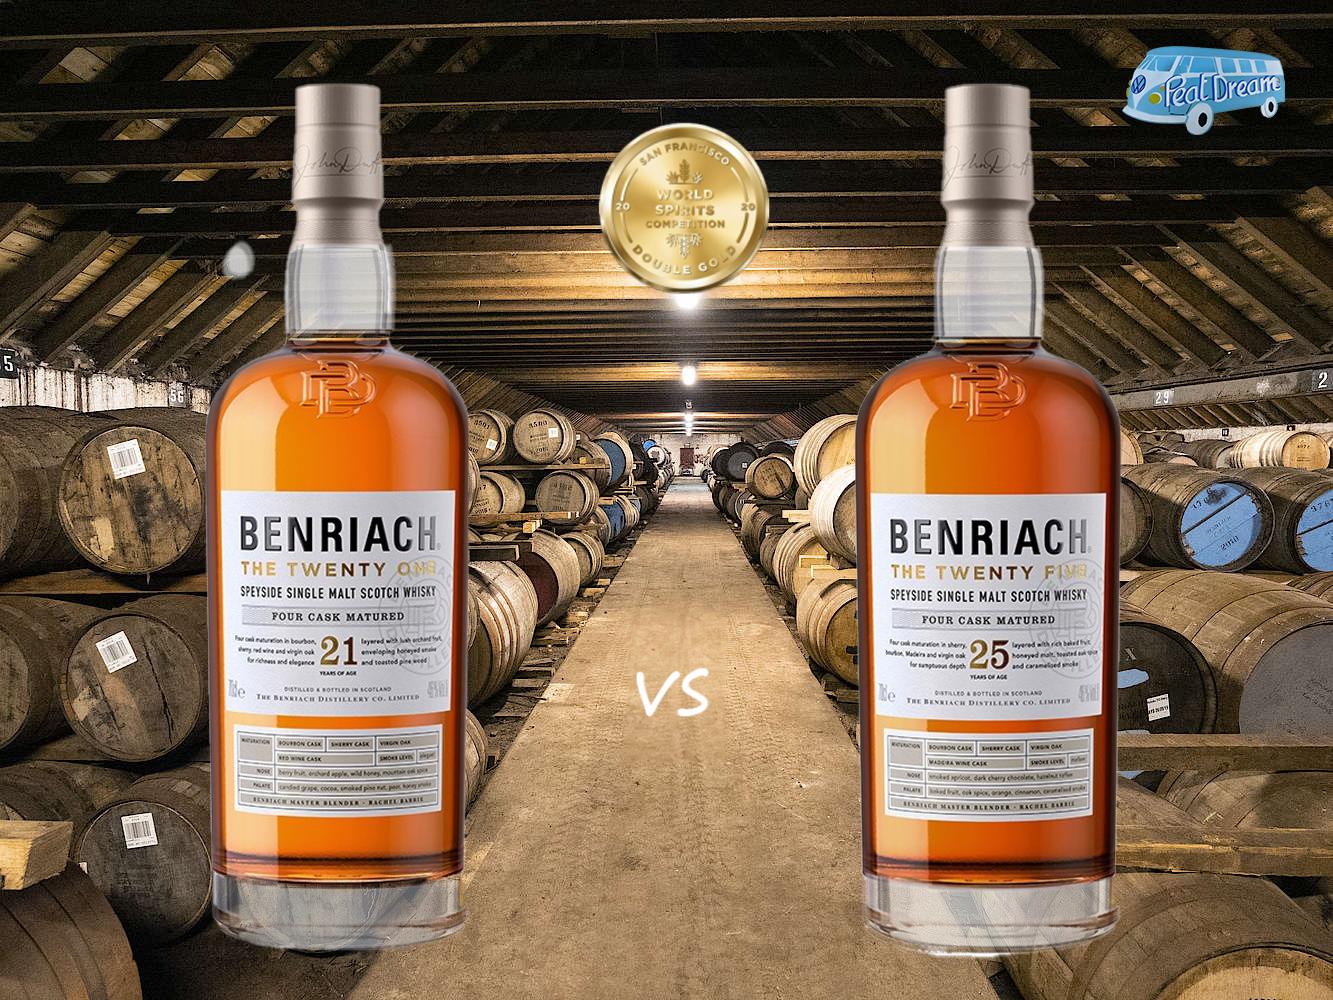 BENRIACH THE TWENTY ONE vs THE TWENTY FIVE